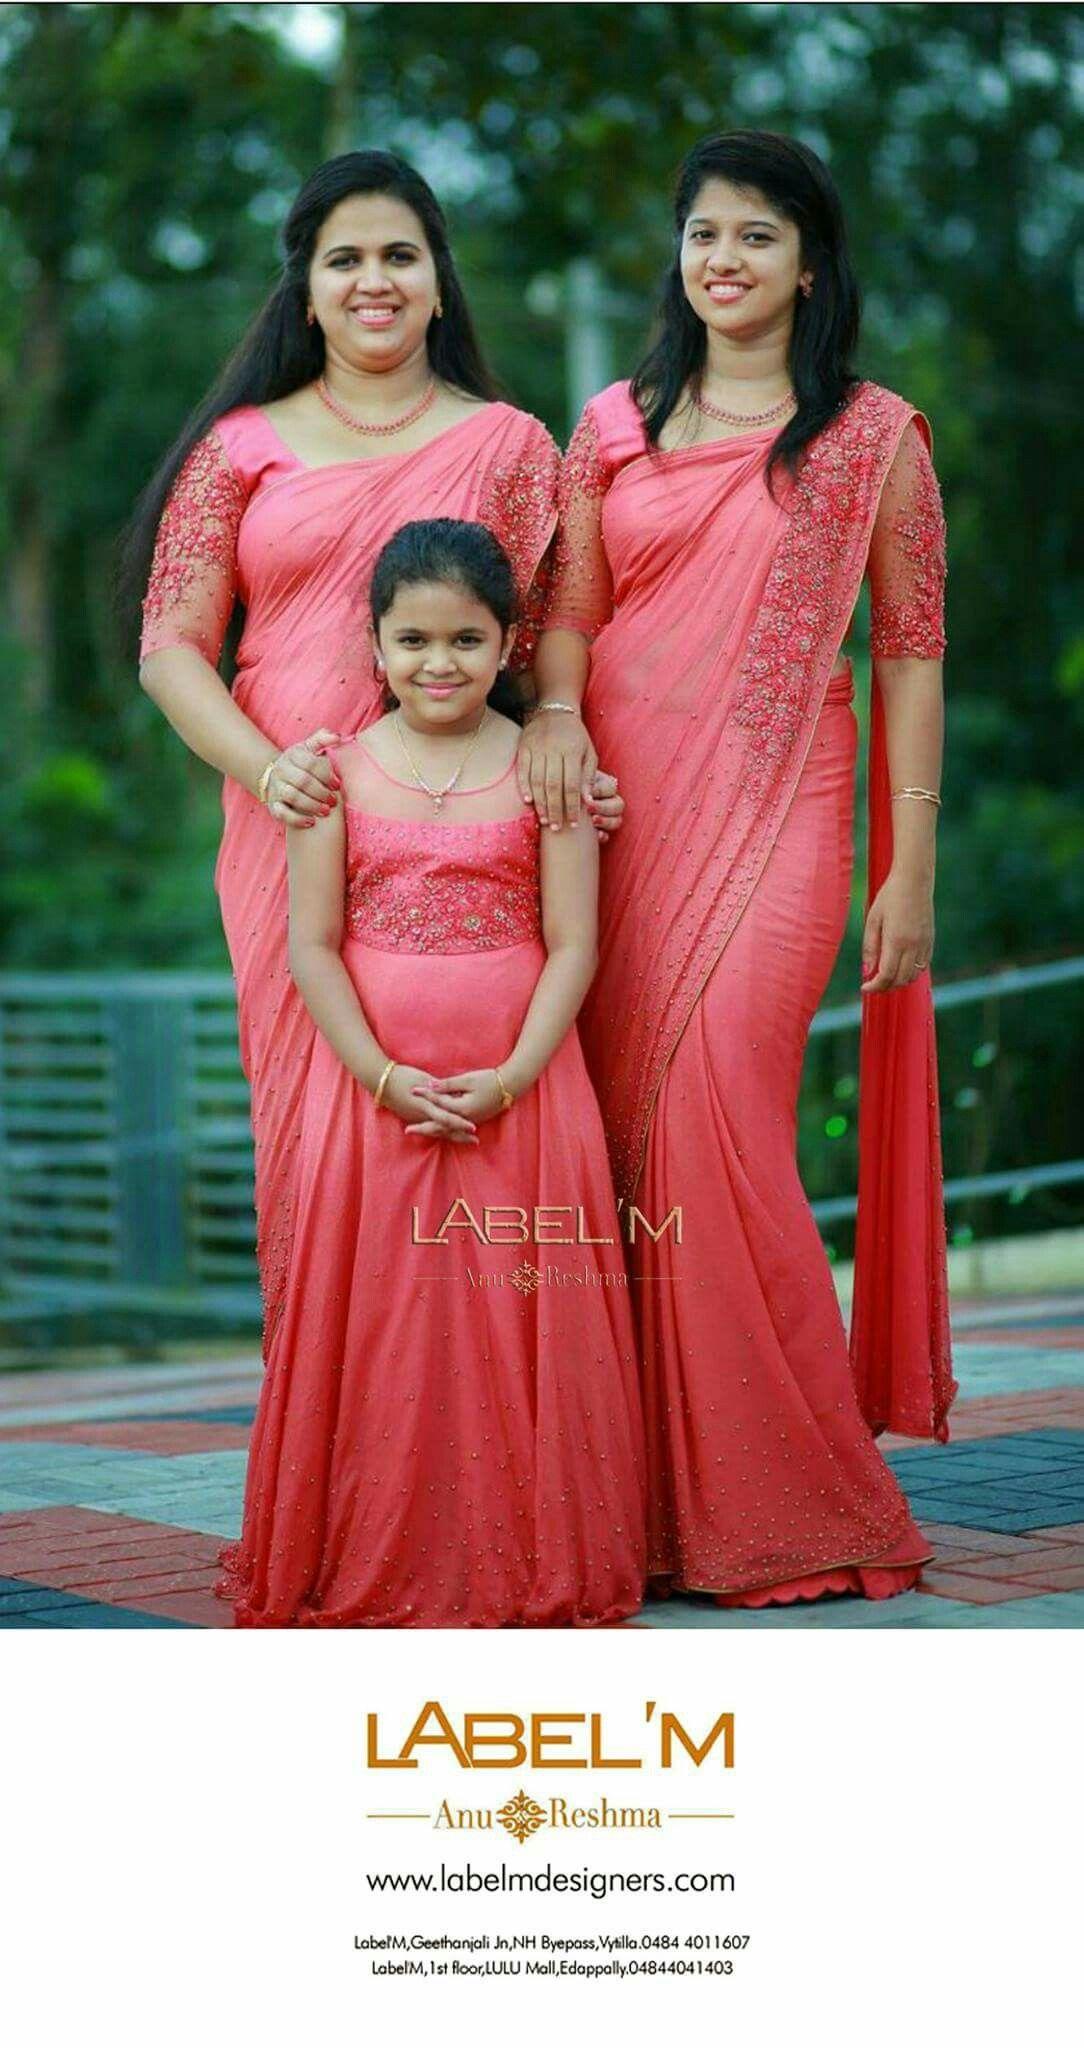 Pin de Avantikananda Nithya en Saree!!!! | Pinterest